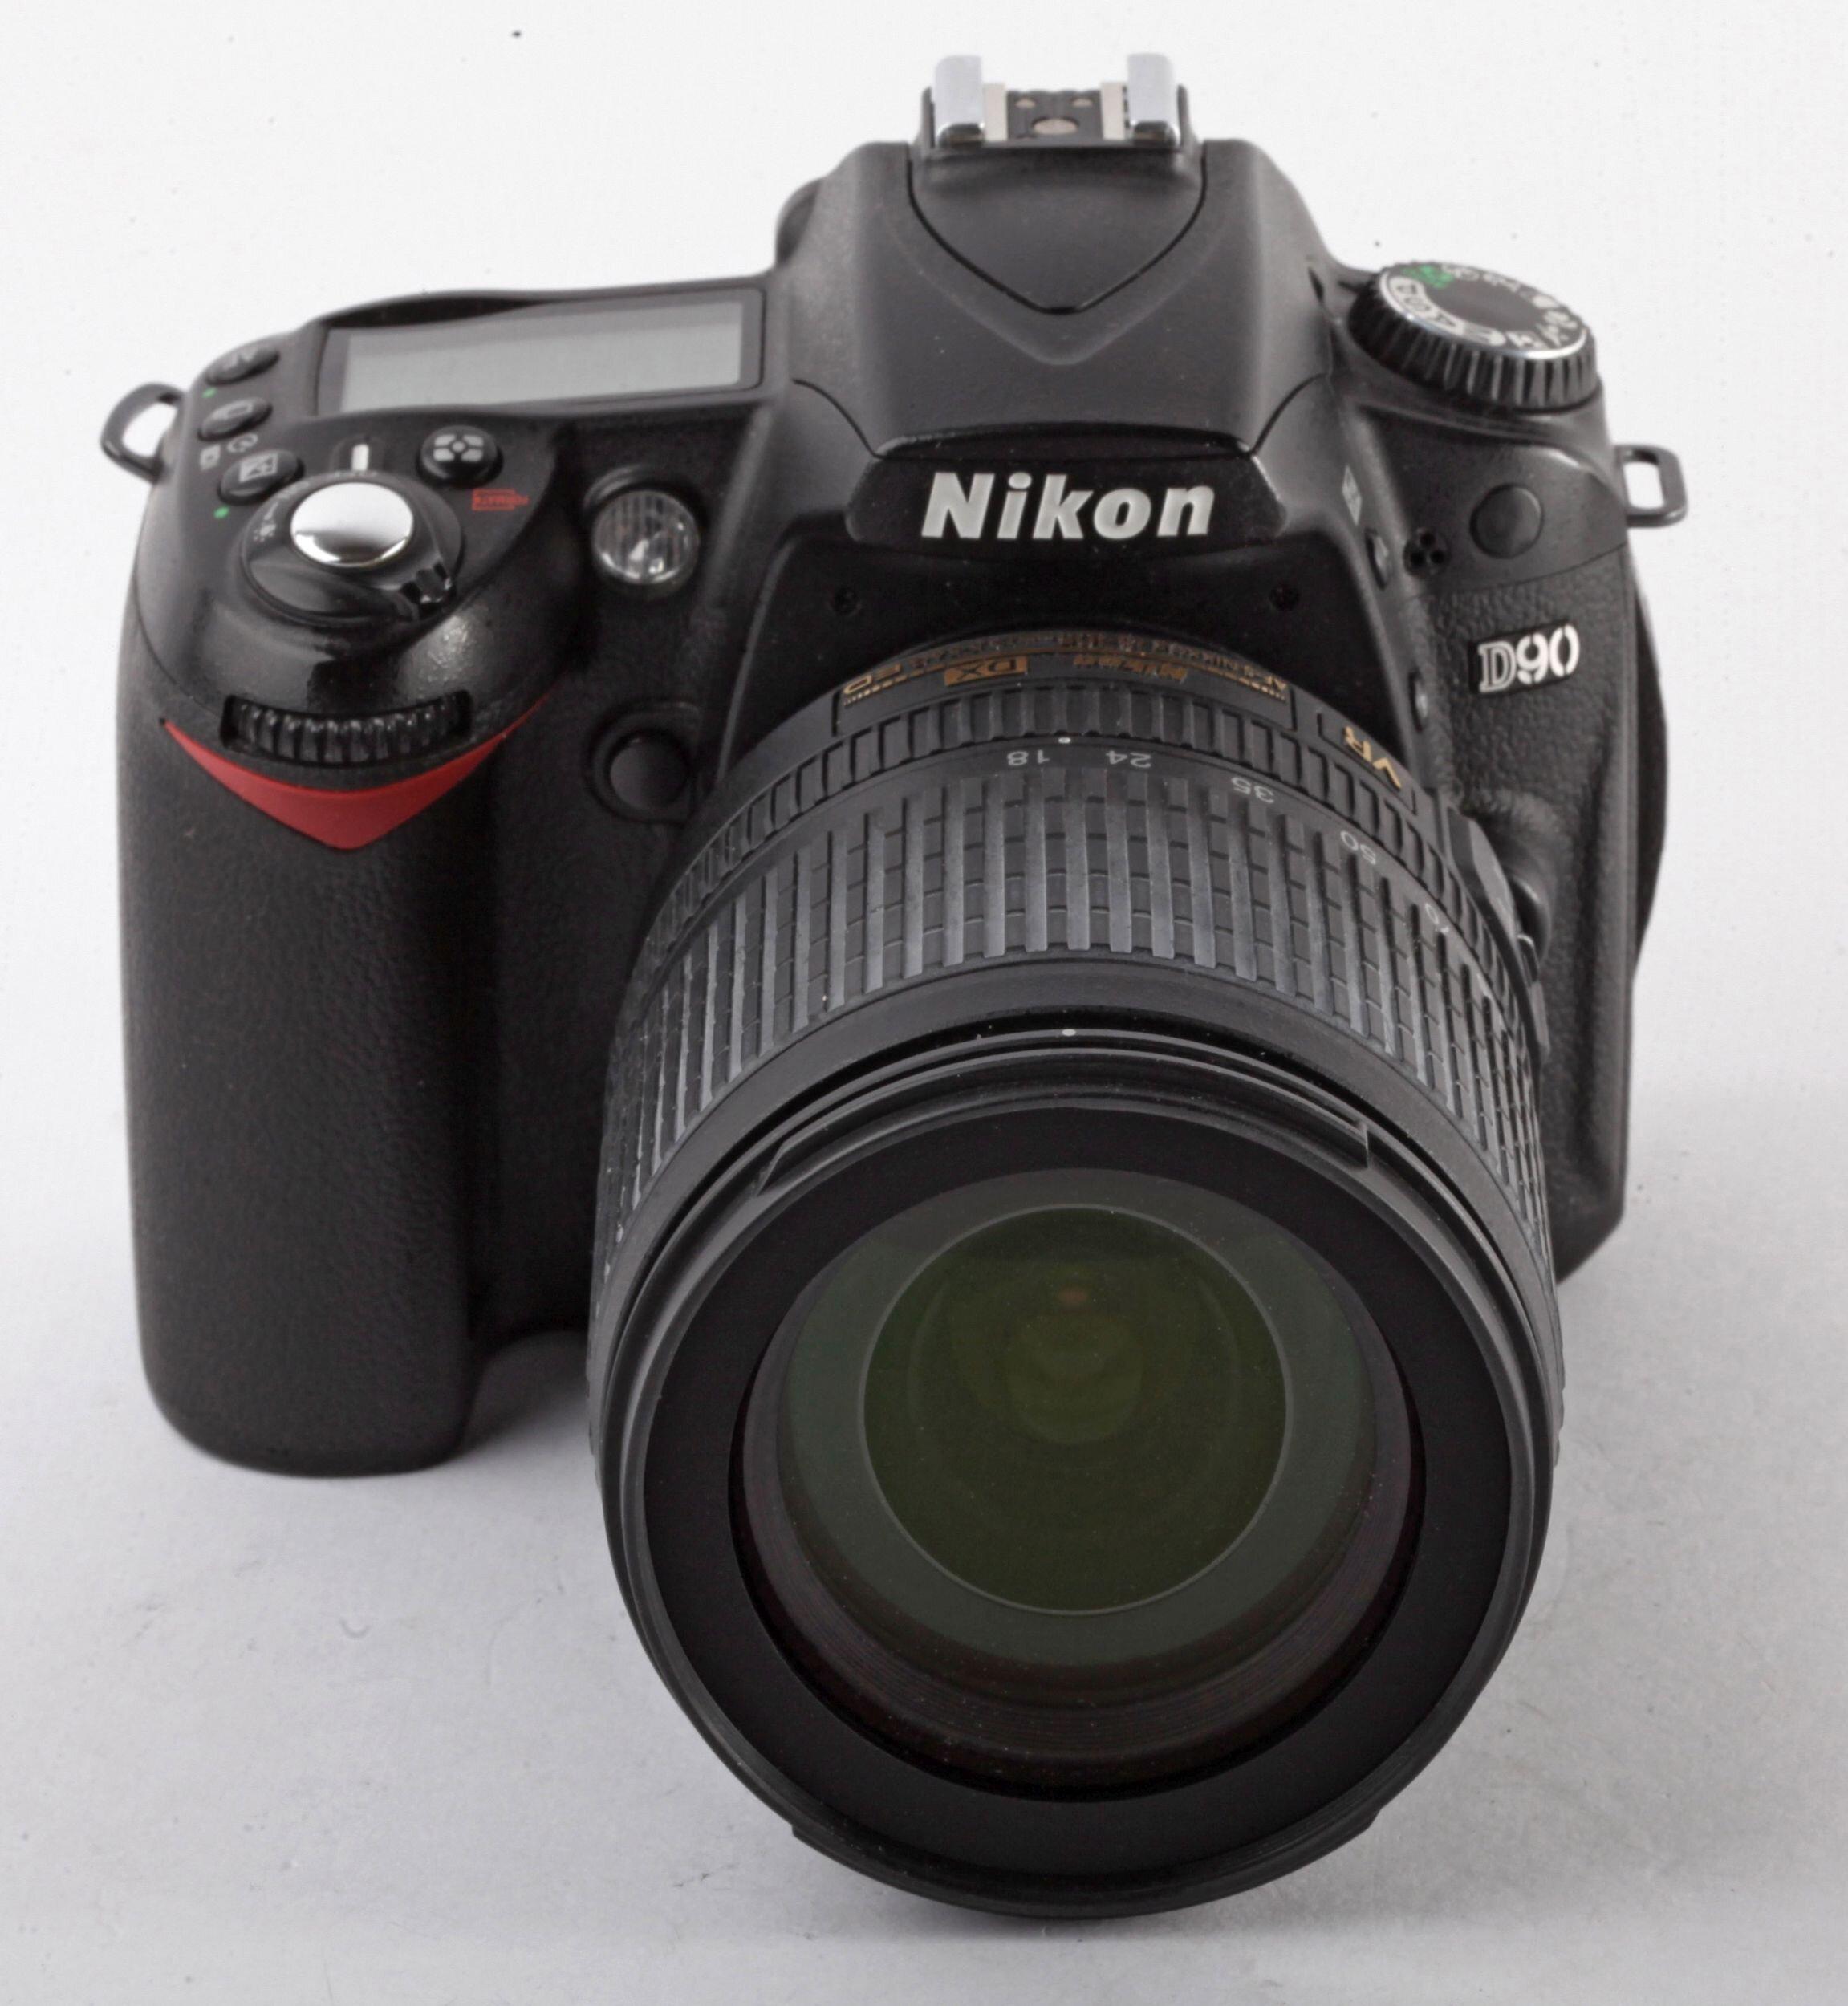 Nikon D90 mit Nikon AF-S 18-105mm 43000 Auslösungen